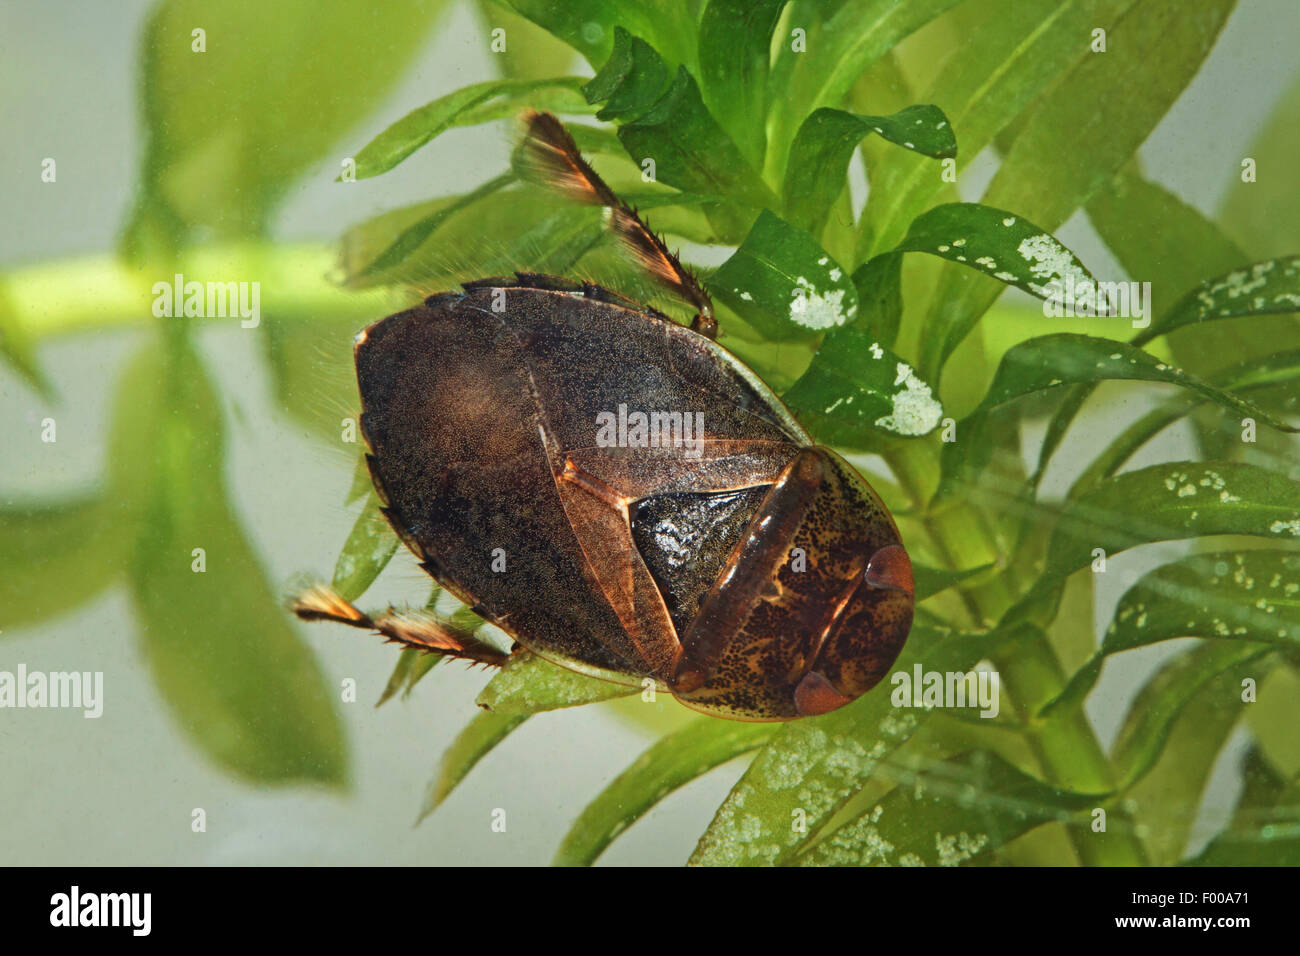 Saucer bug, Creeping water bug (Ilyocoris cimicoides, Naucoris cimicoides), on Elodea, Germany - Stock Image